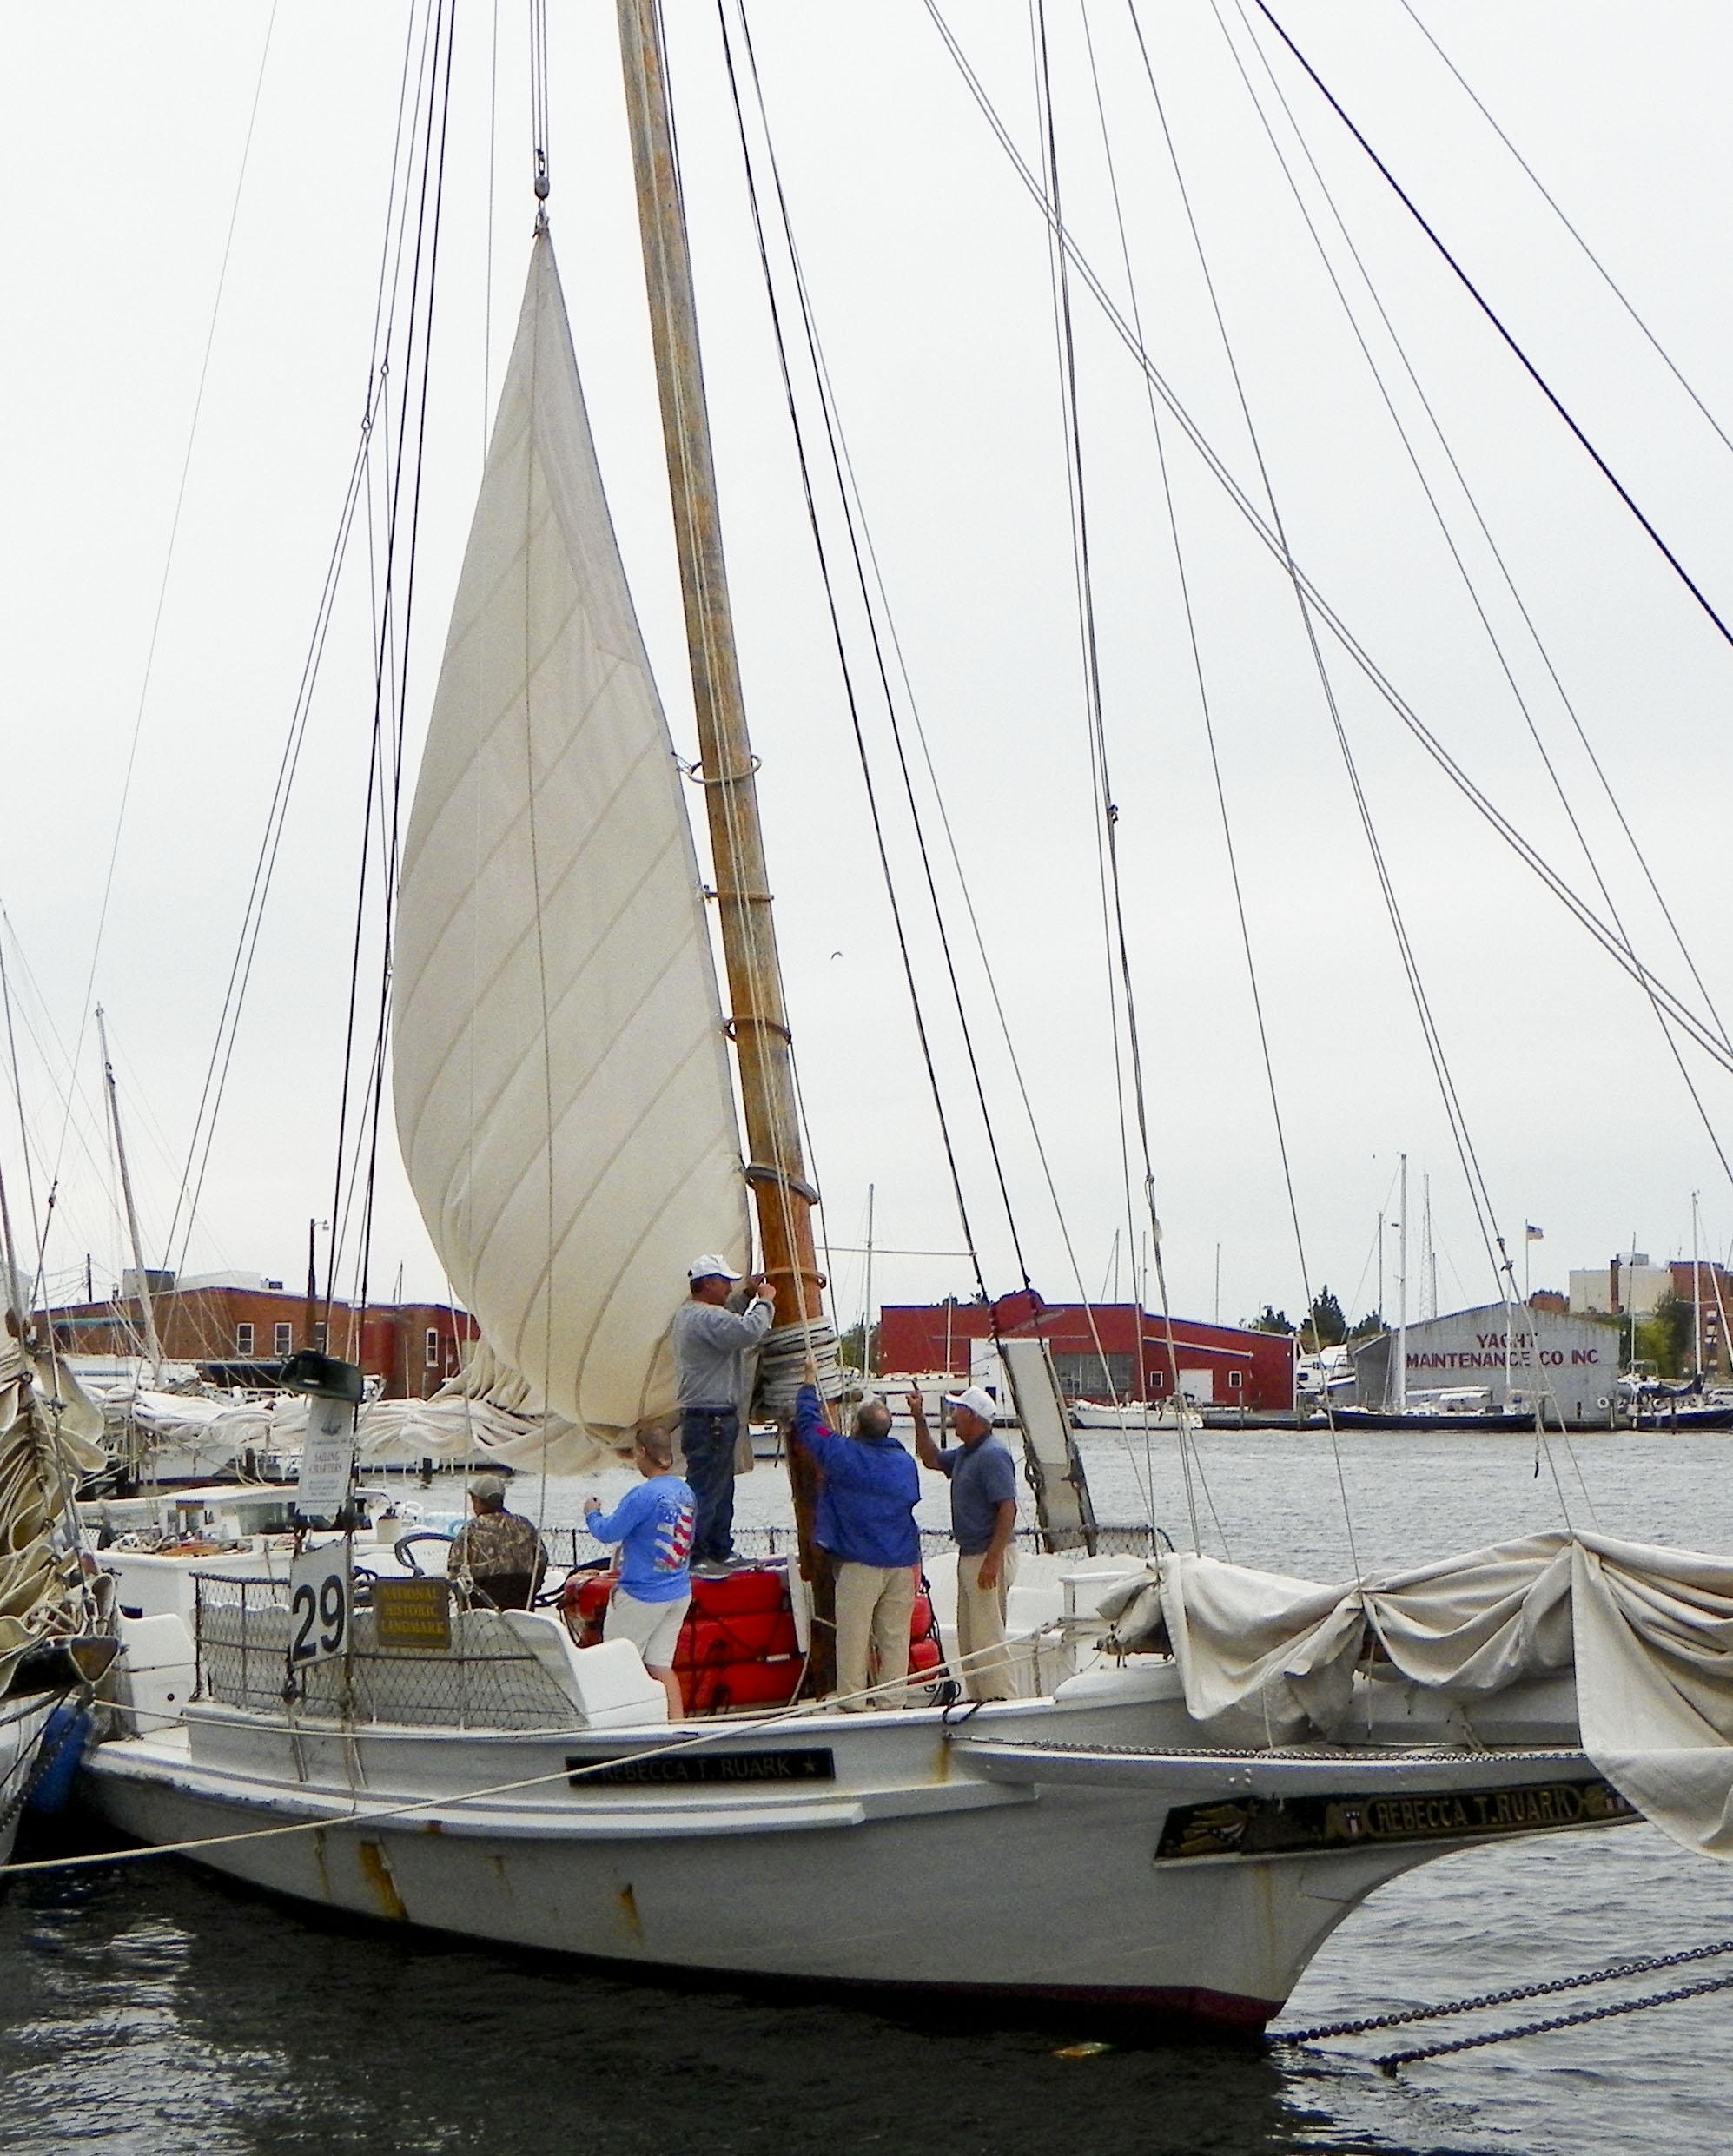 Rebecca T. Ruark Skipjack Boat in Maryland